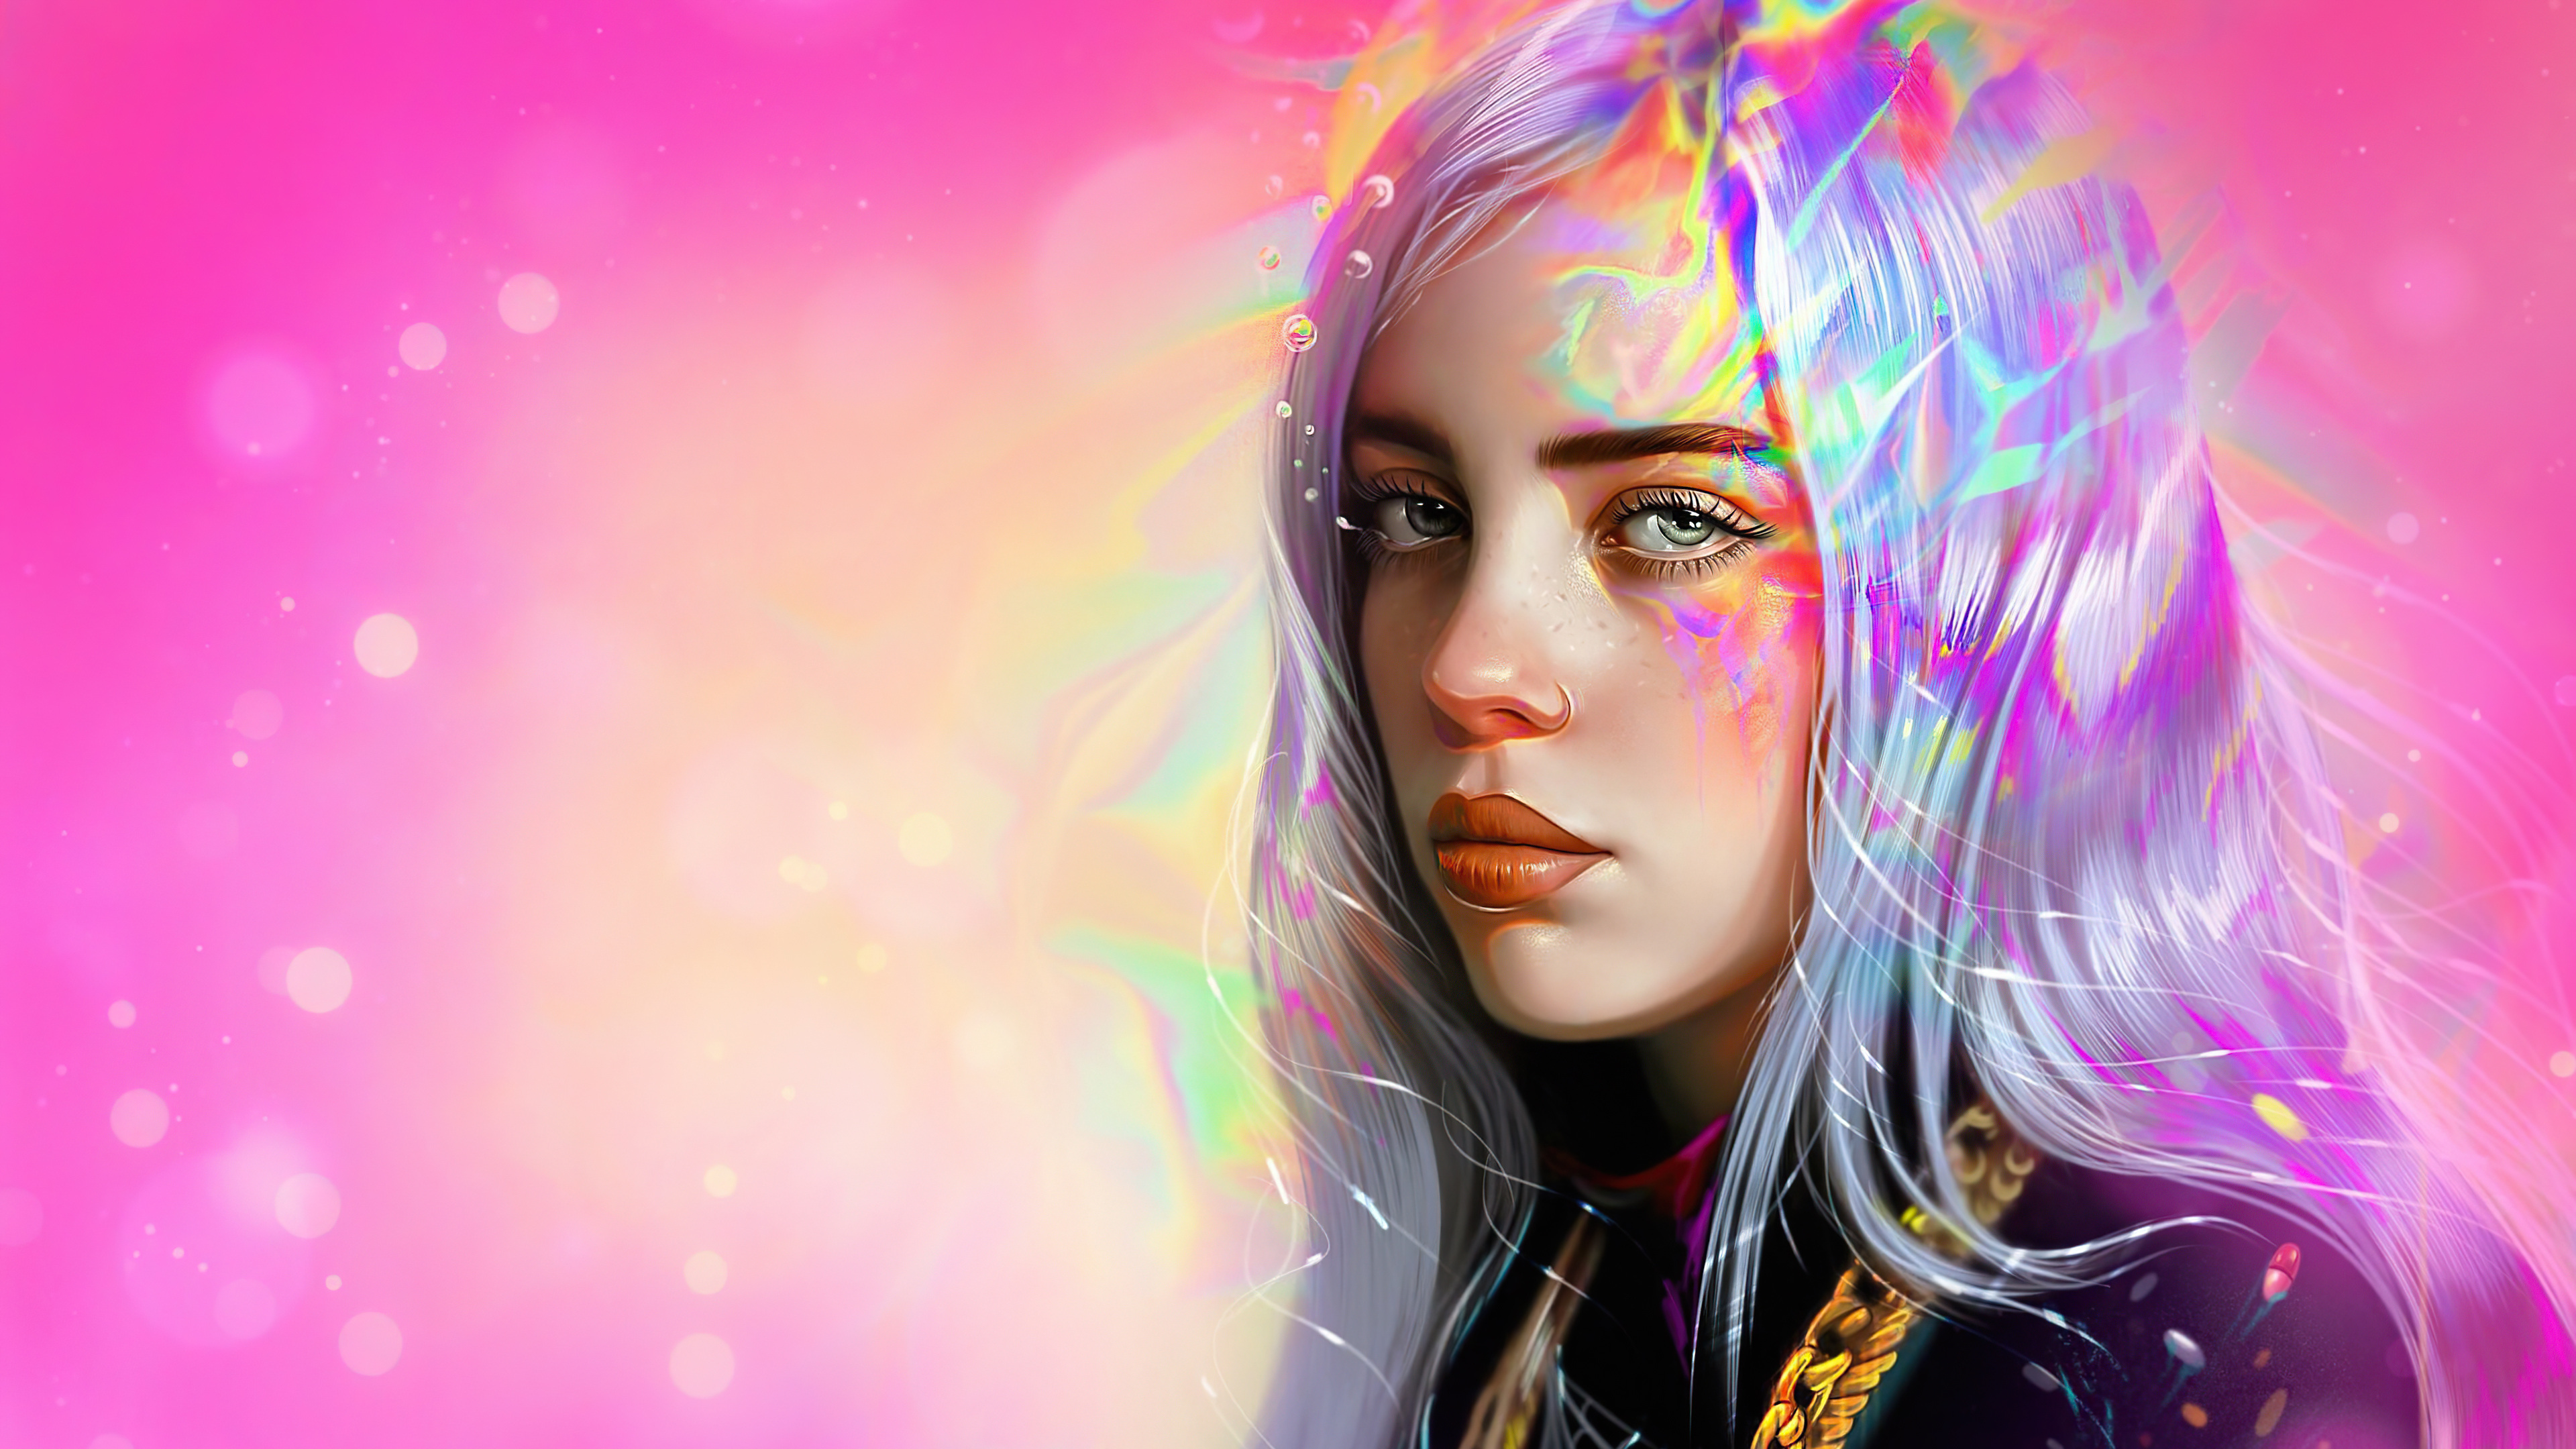 Billie Eilish 4k Ultra HD Wallpaper | Background Image ...